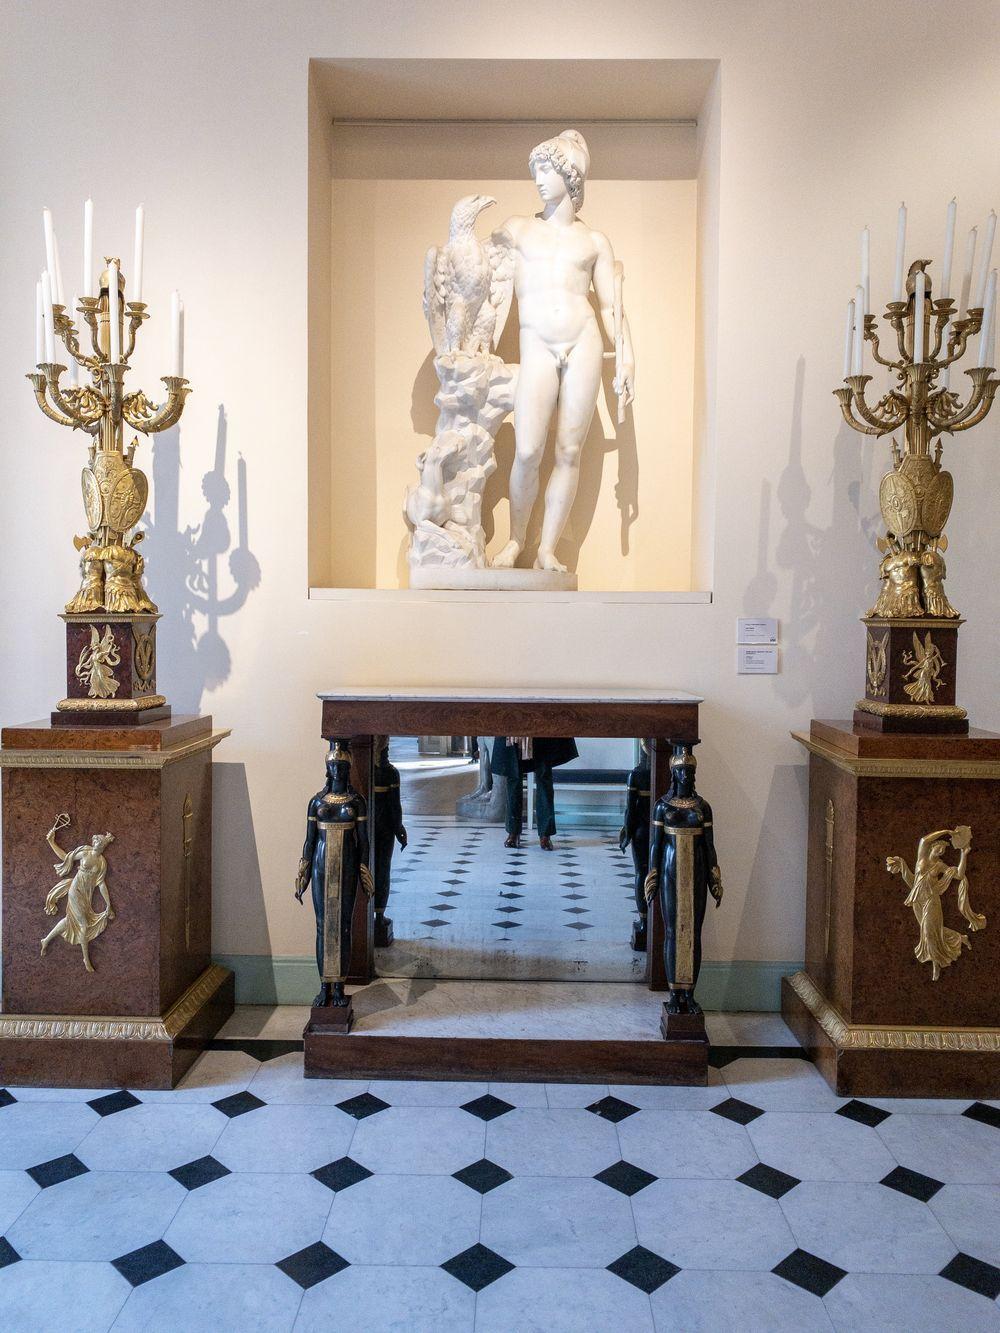 Musee Marmottan Monet - Ecole d'Antonio Canova, Ganymède